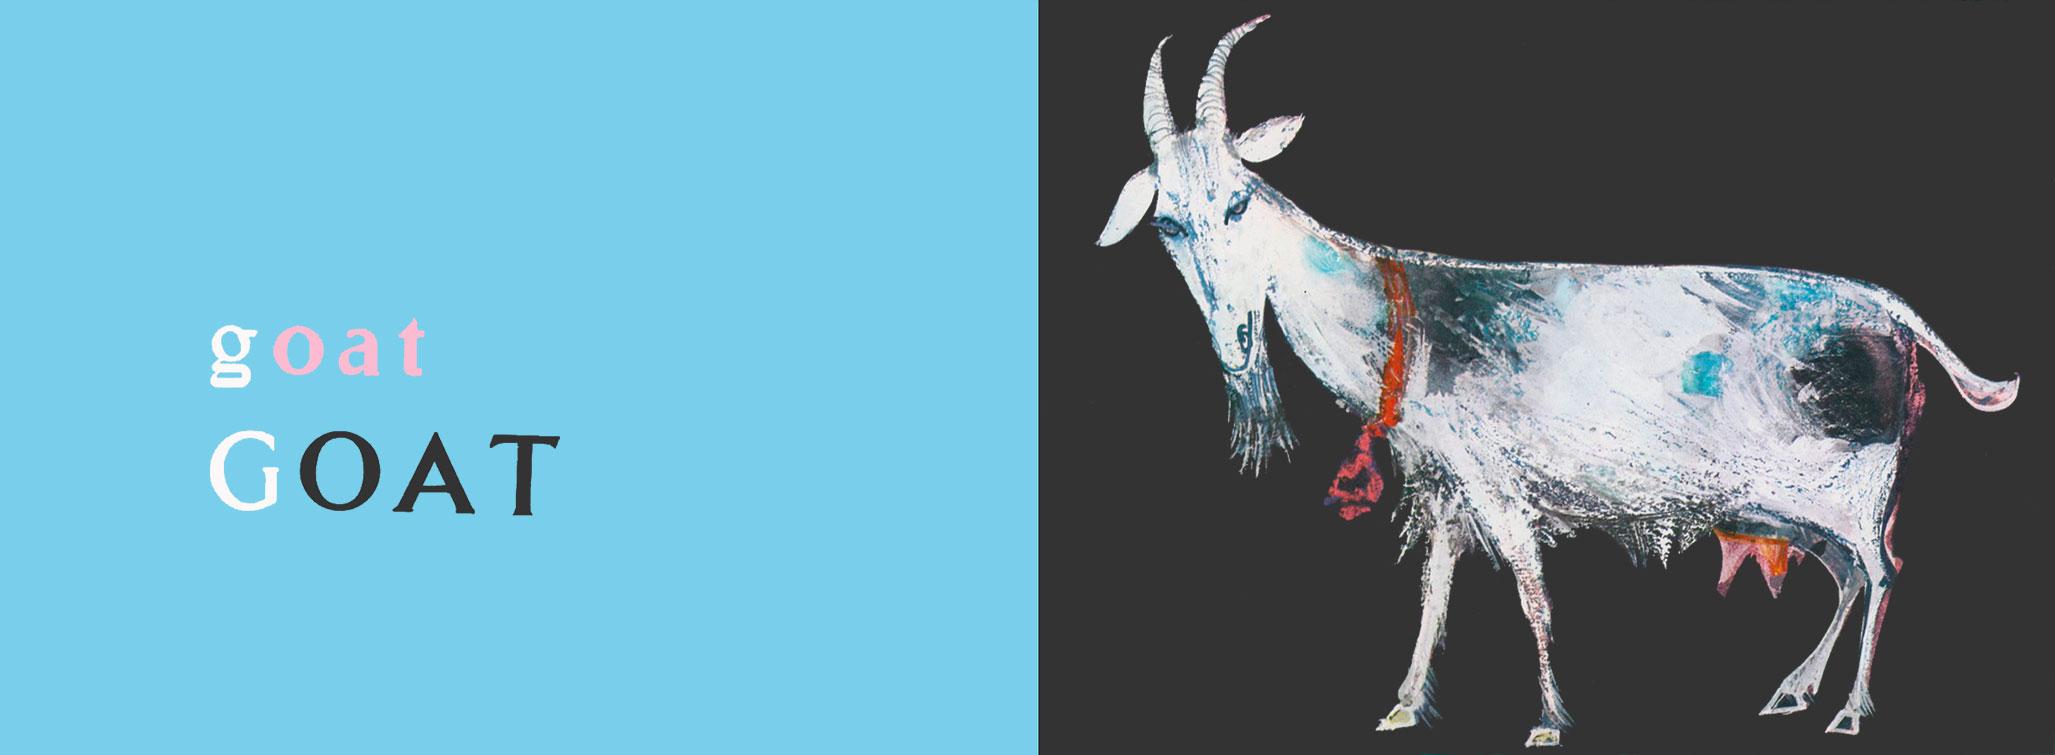 G-for-goat-brian-wildsmith-ABC.jpg